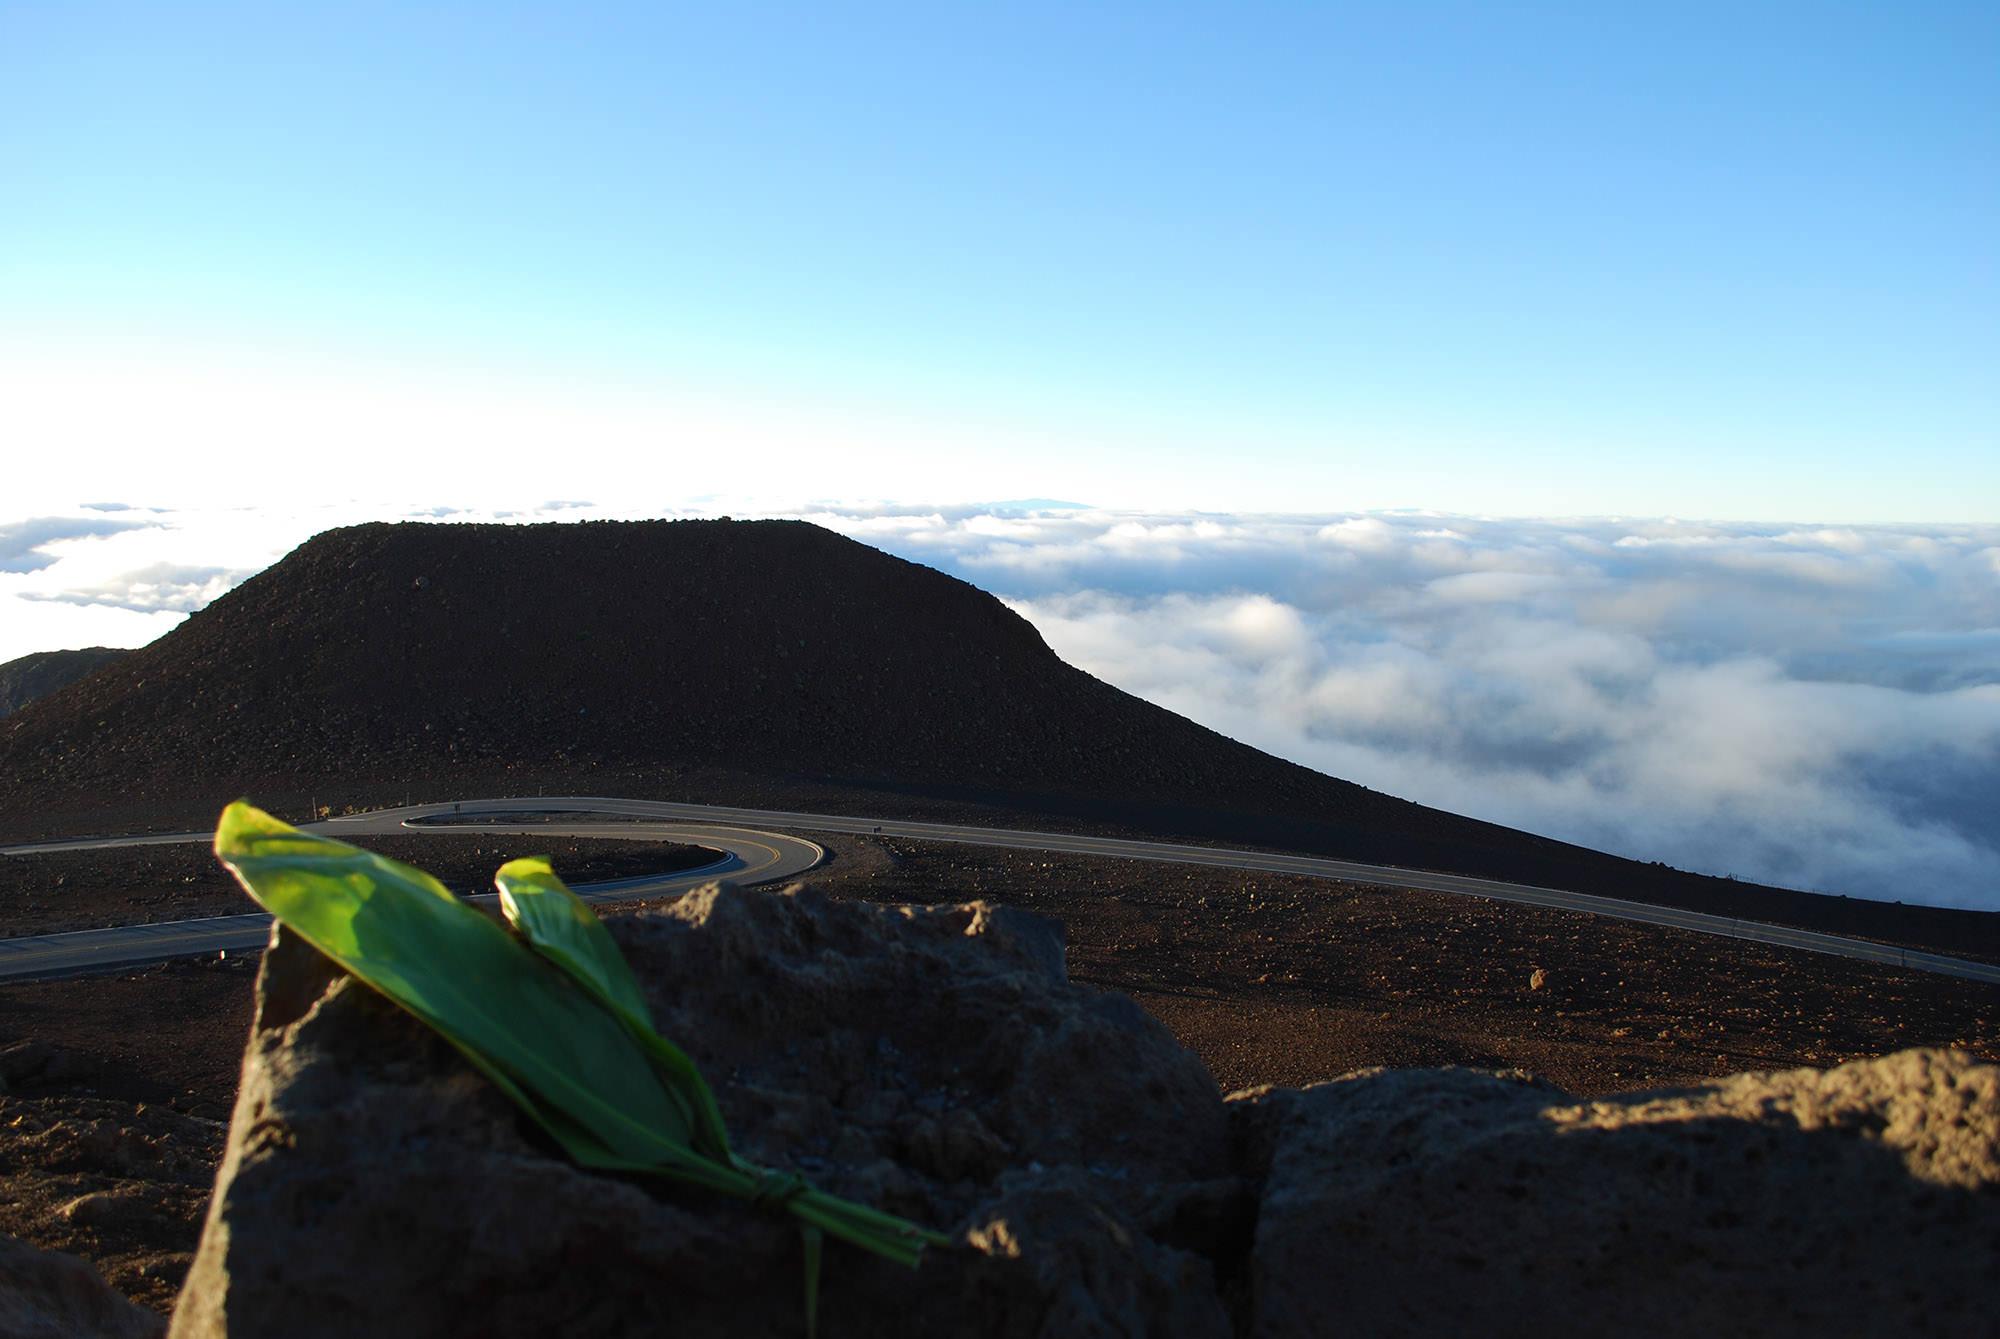 Fig. 27 Offering on summit of Haleakalā, Maui, with summit of Mauna Kea (Mauna a Wākea) in distance, July 2015. Photo: ©Sally Promey